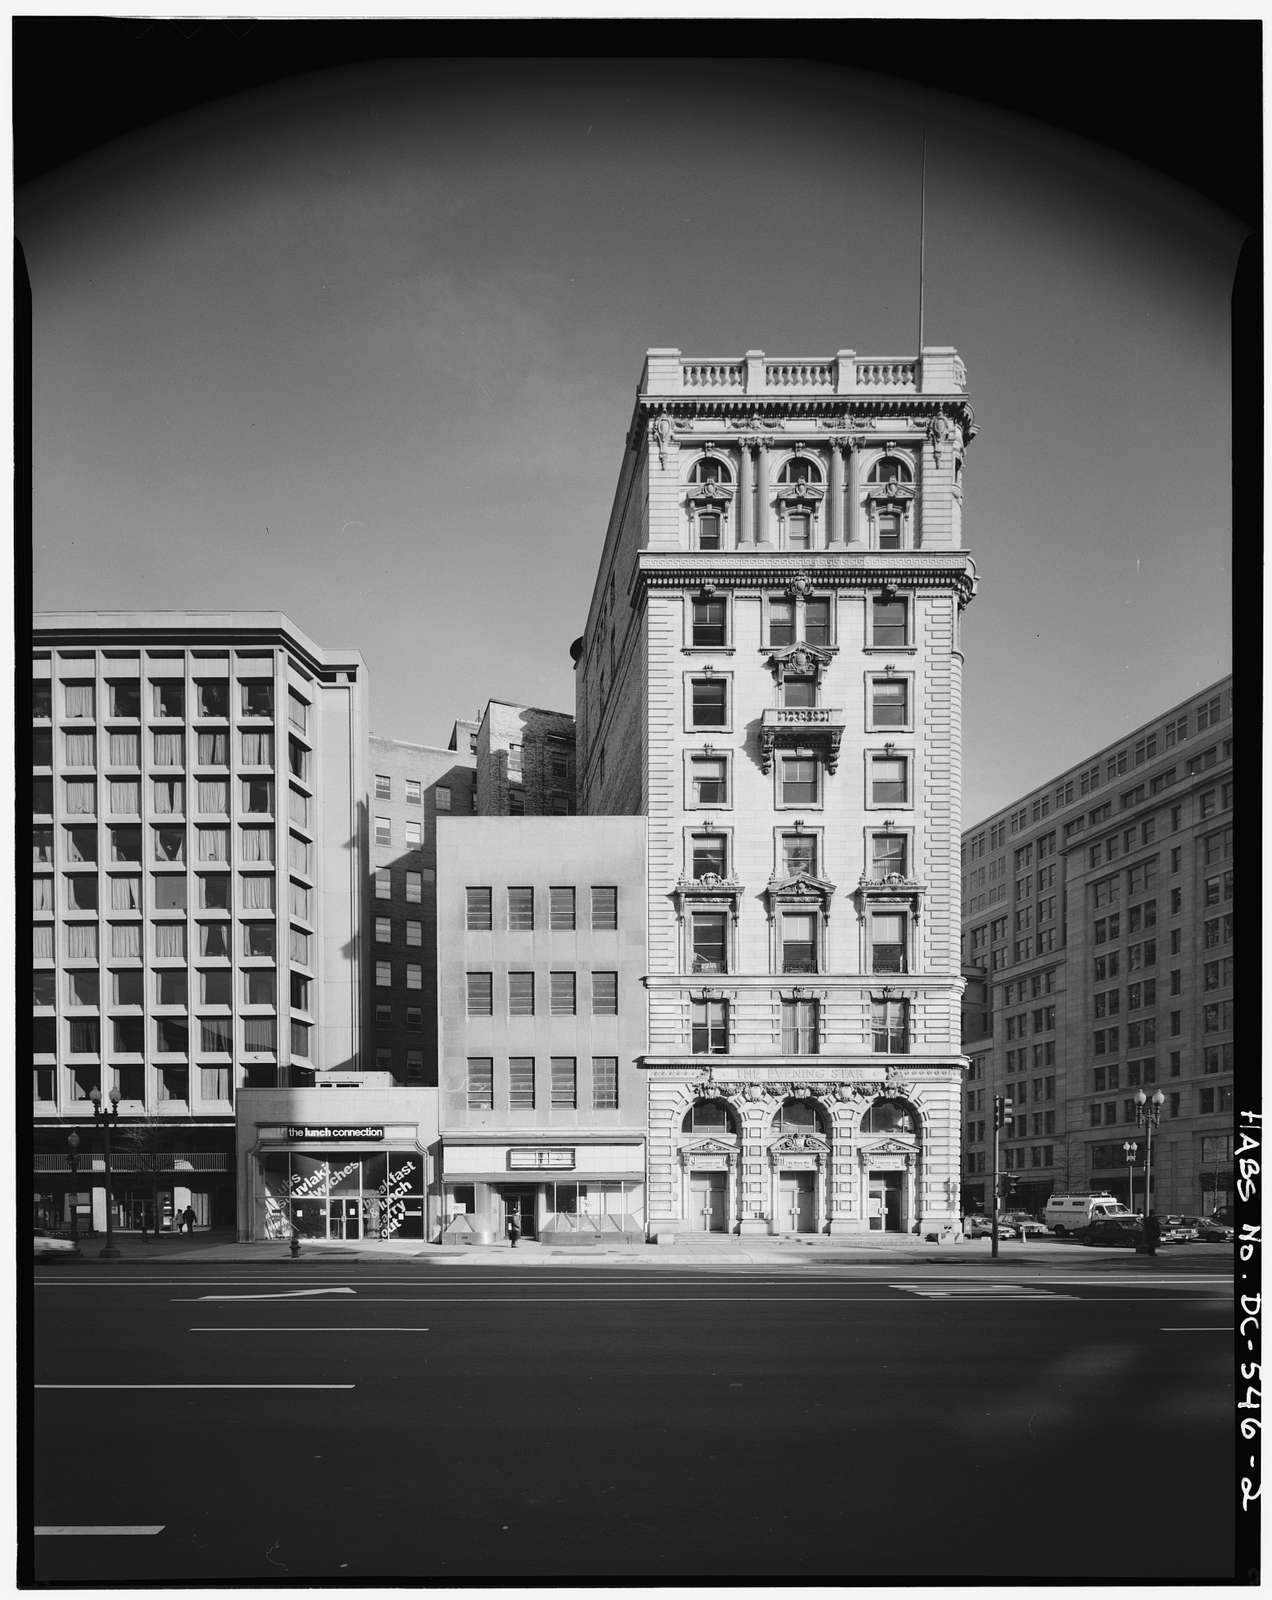 Galt & Brother Jewelers, 1107 Pennsylvania Avenue Northwest, Washington, District of Columbia, DC